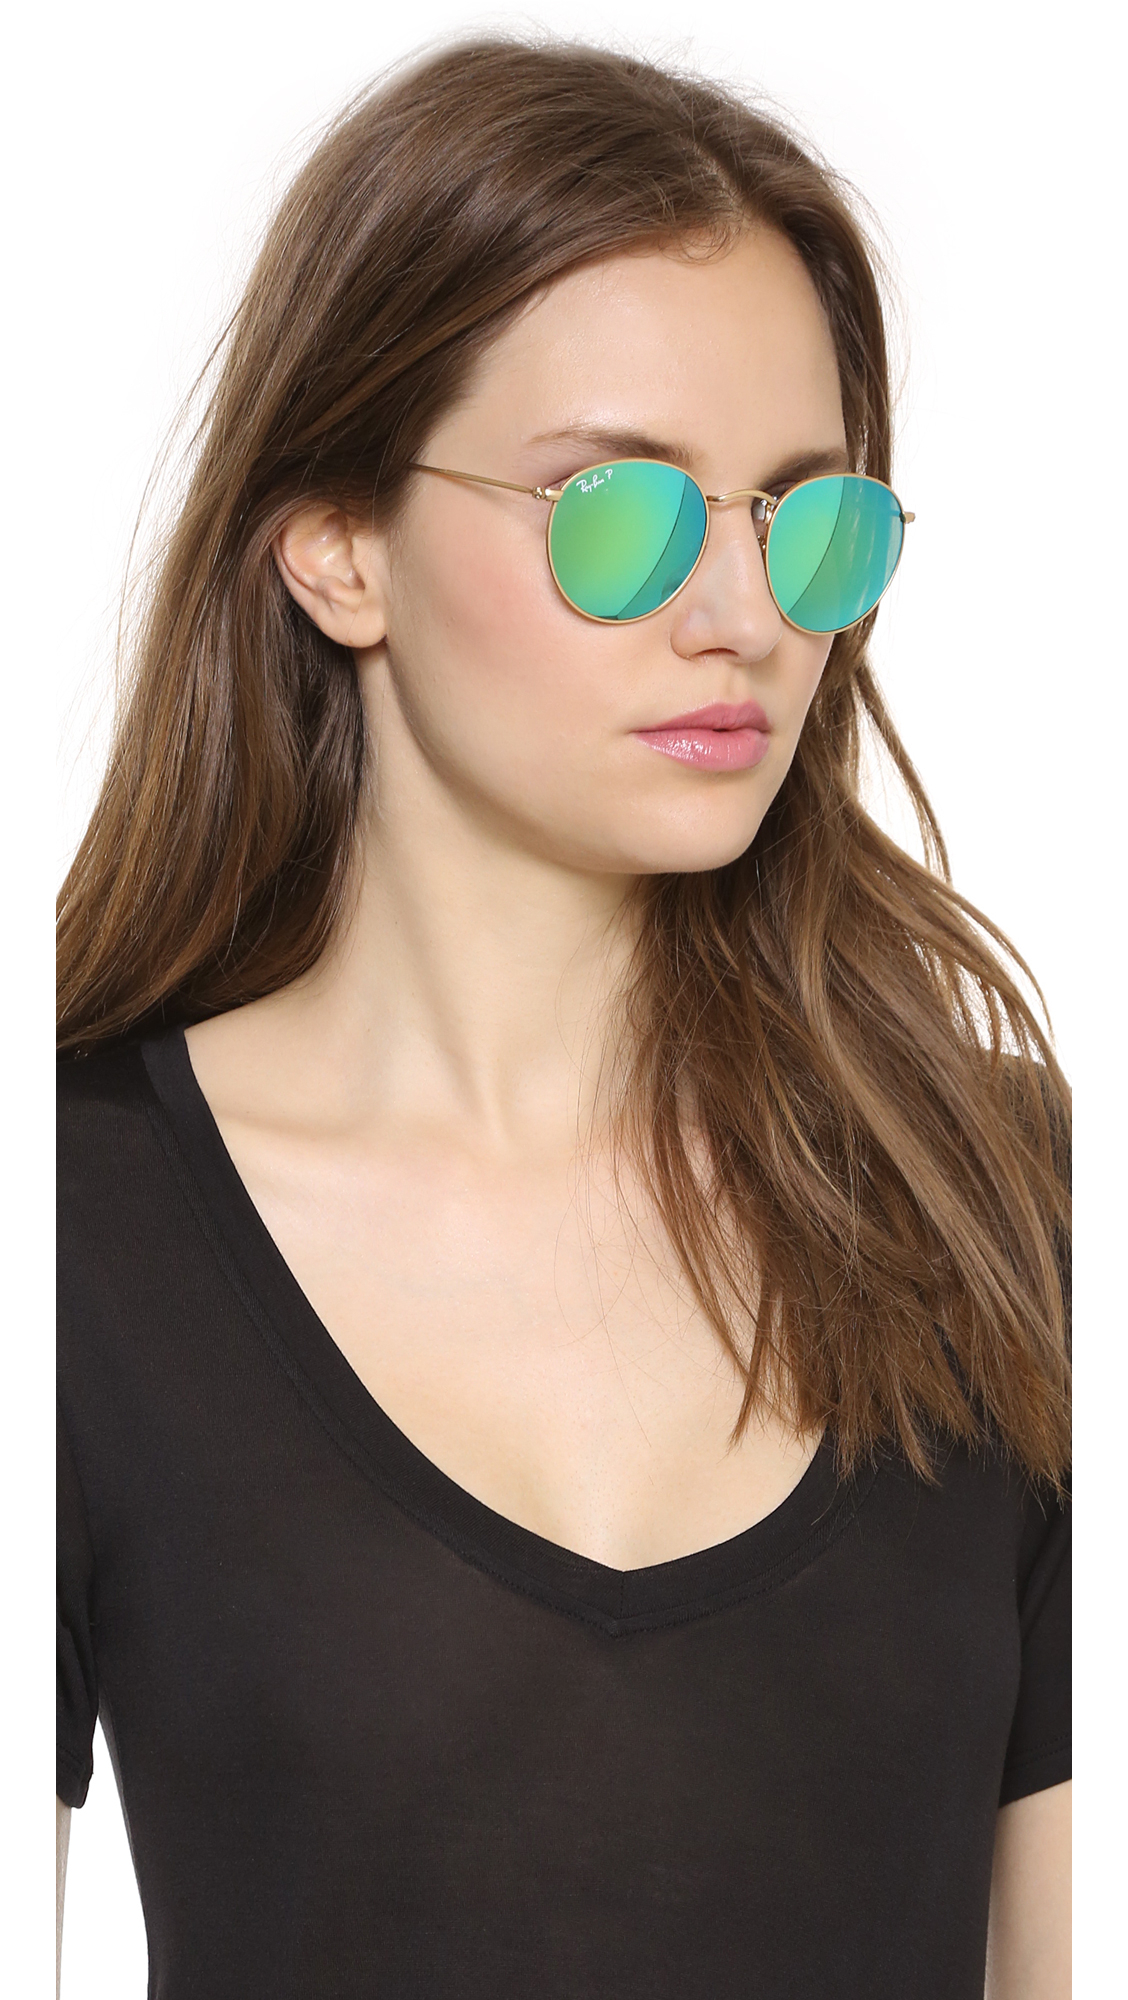 Ed Ray Ban Sunglasses  ray ban mirrrored polarized icons sunglasses matte goldorange